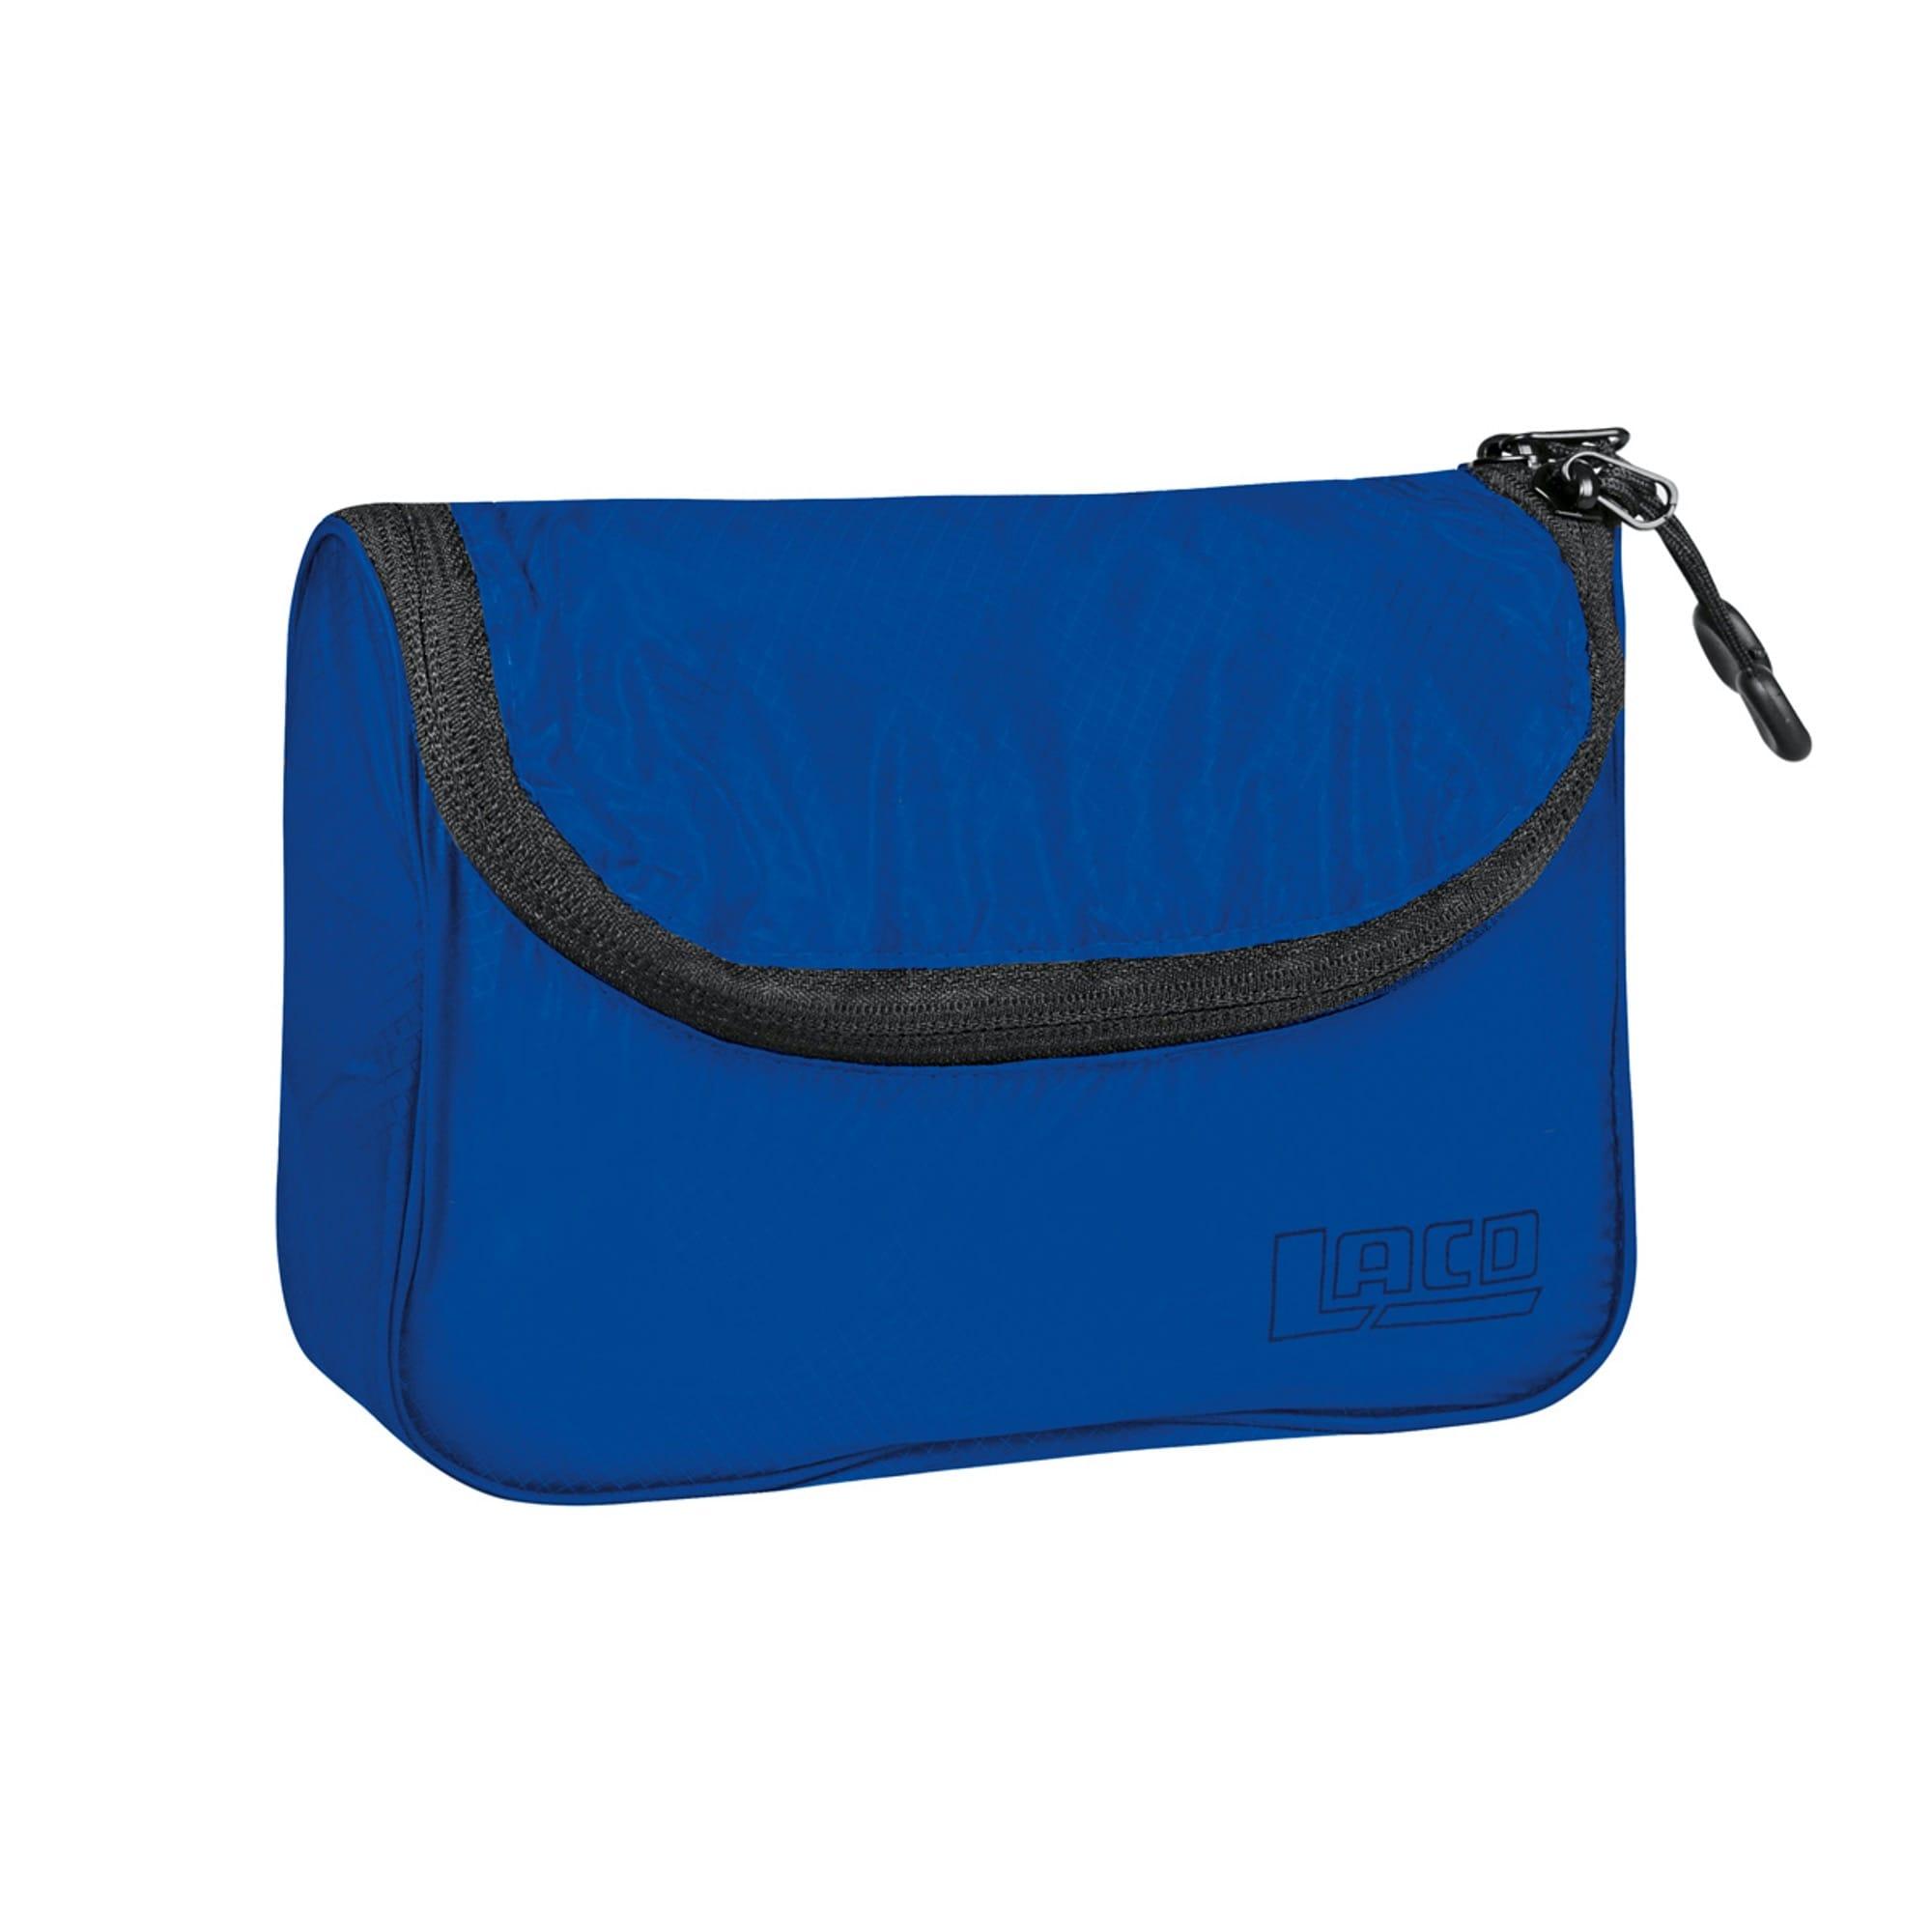 LACD – Wash Bag